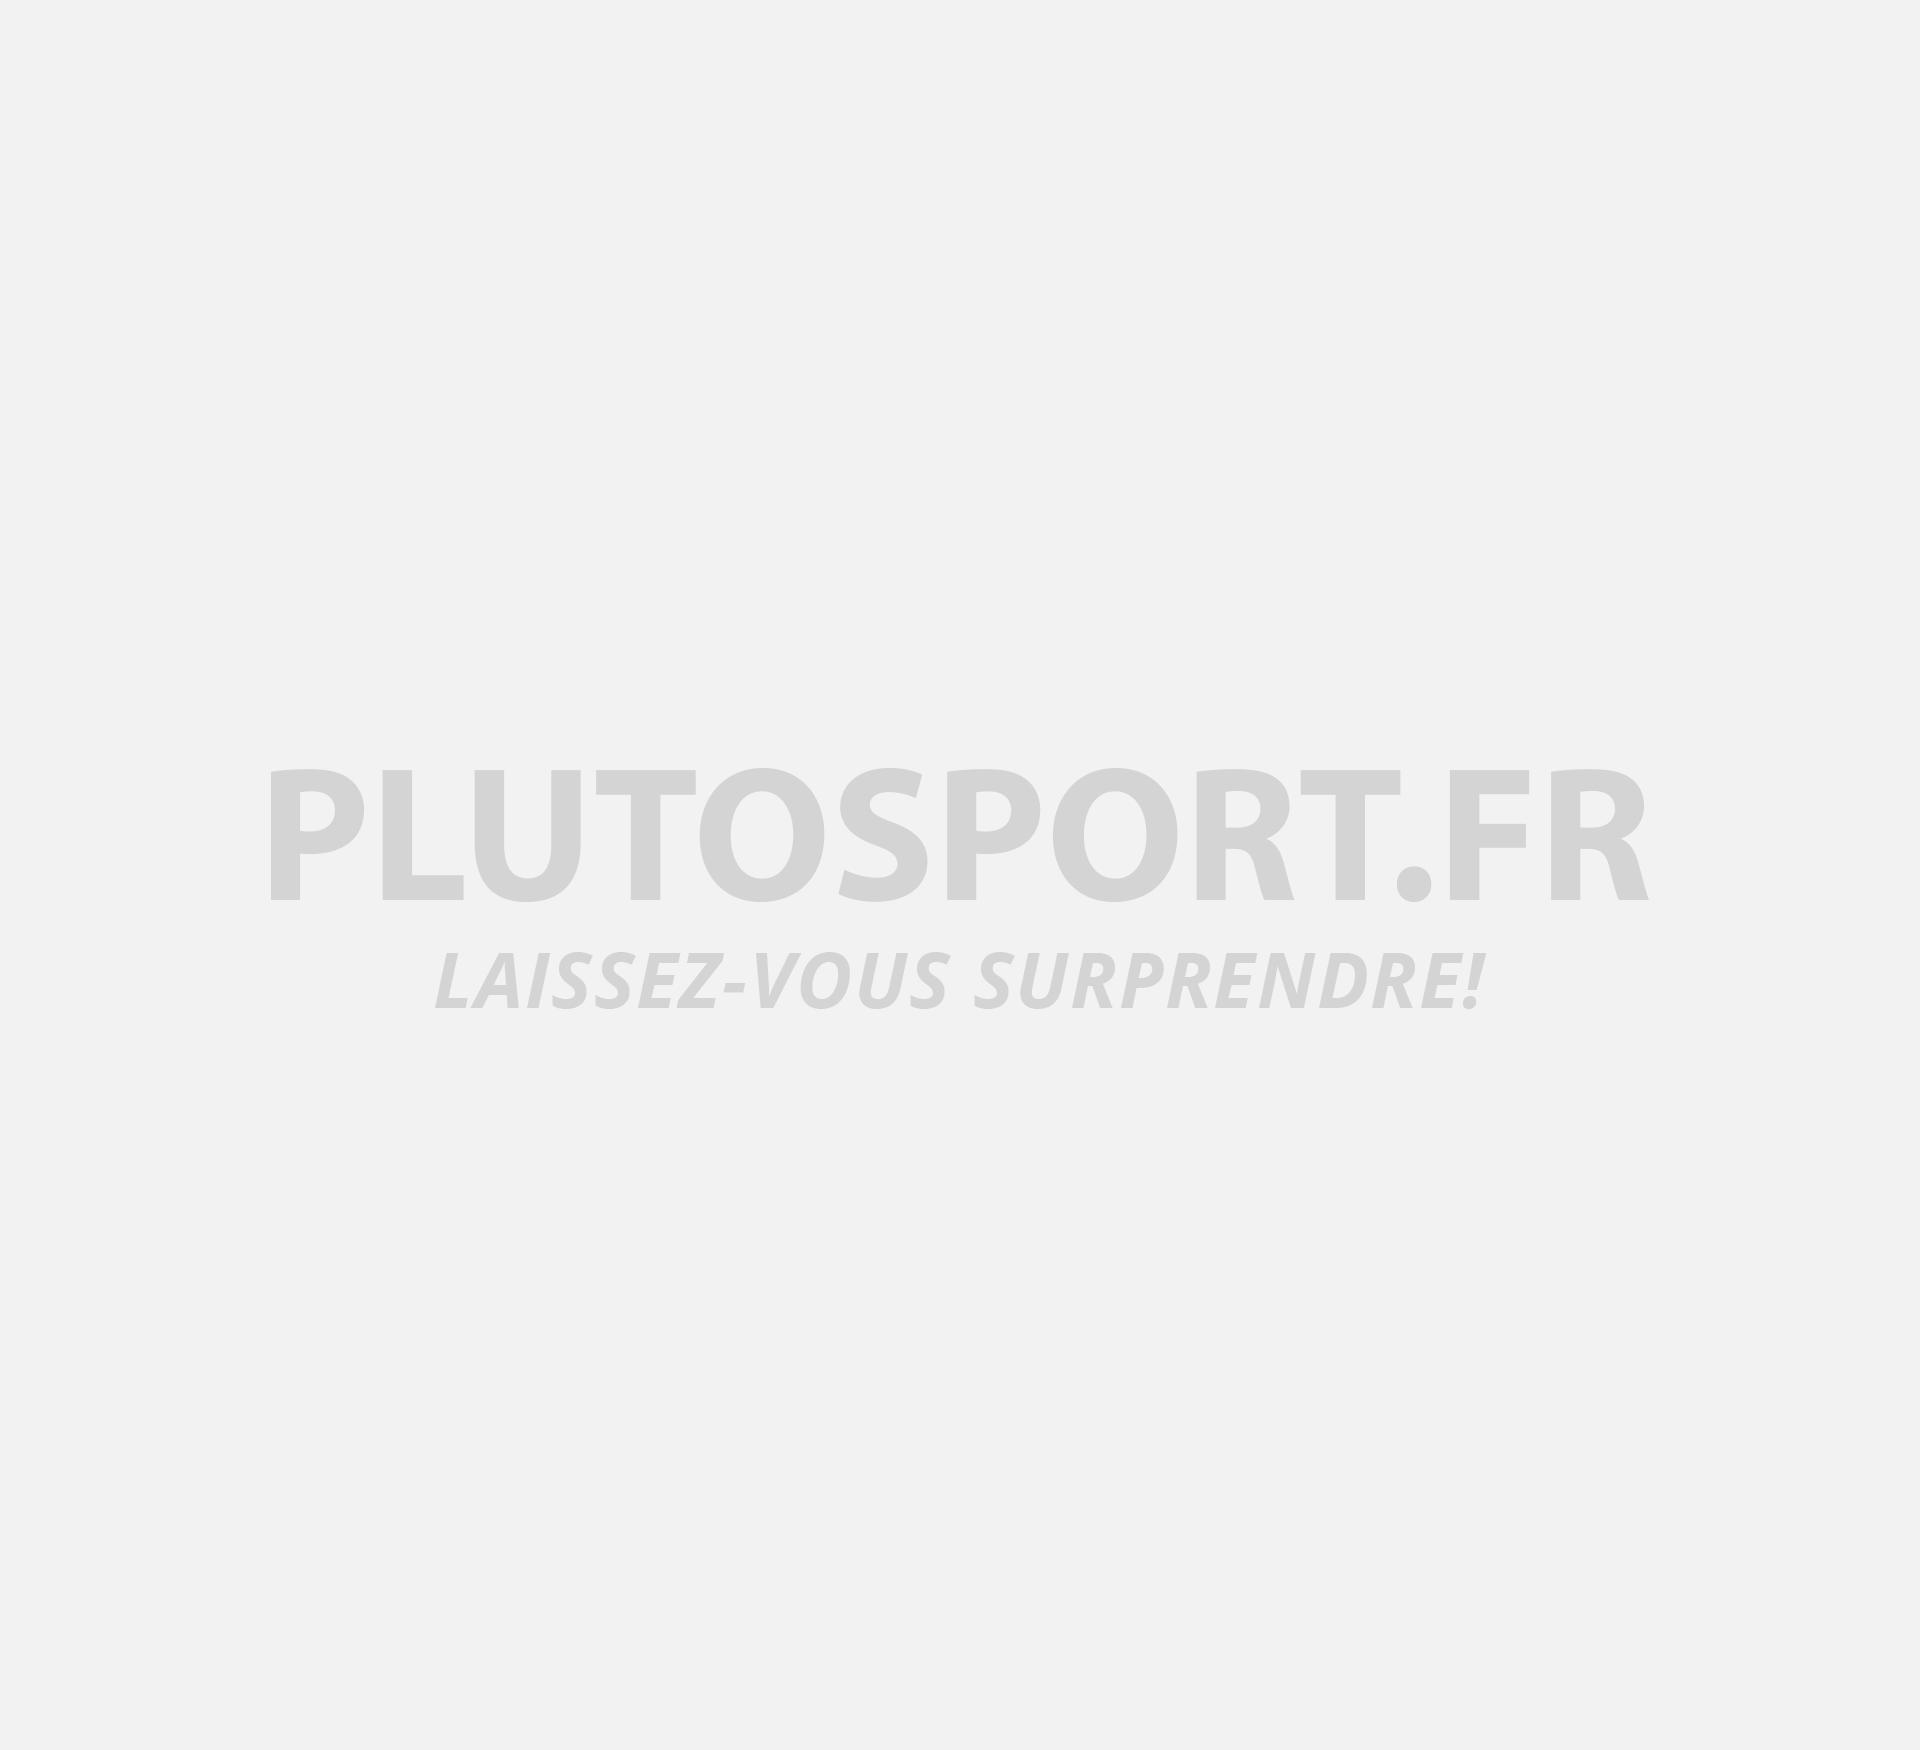 Plutosport.fr - Un point facile !